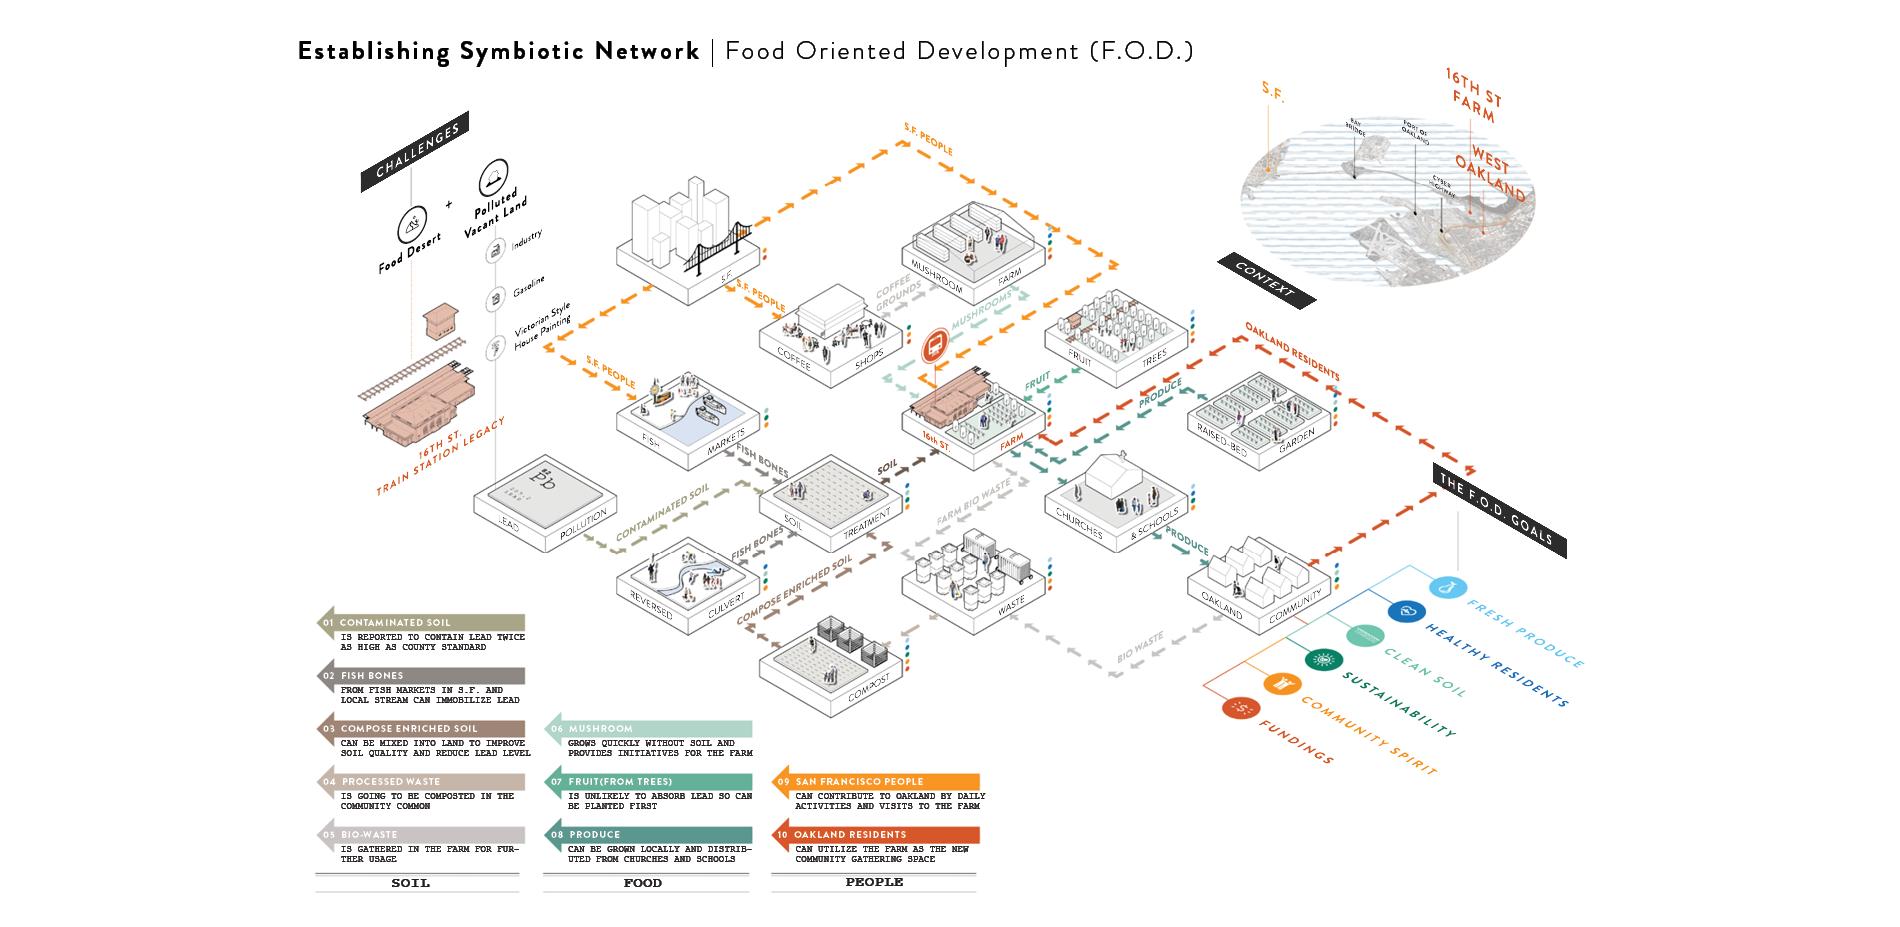 Establishing Symbiotic Network | Food Oriented Development (F.O.D.)